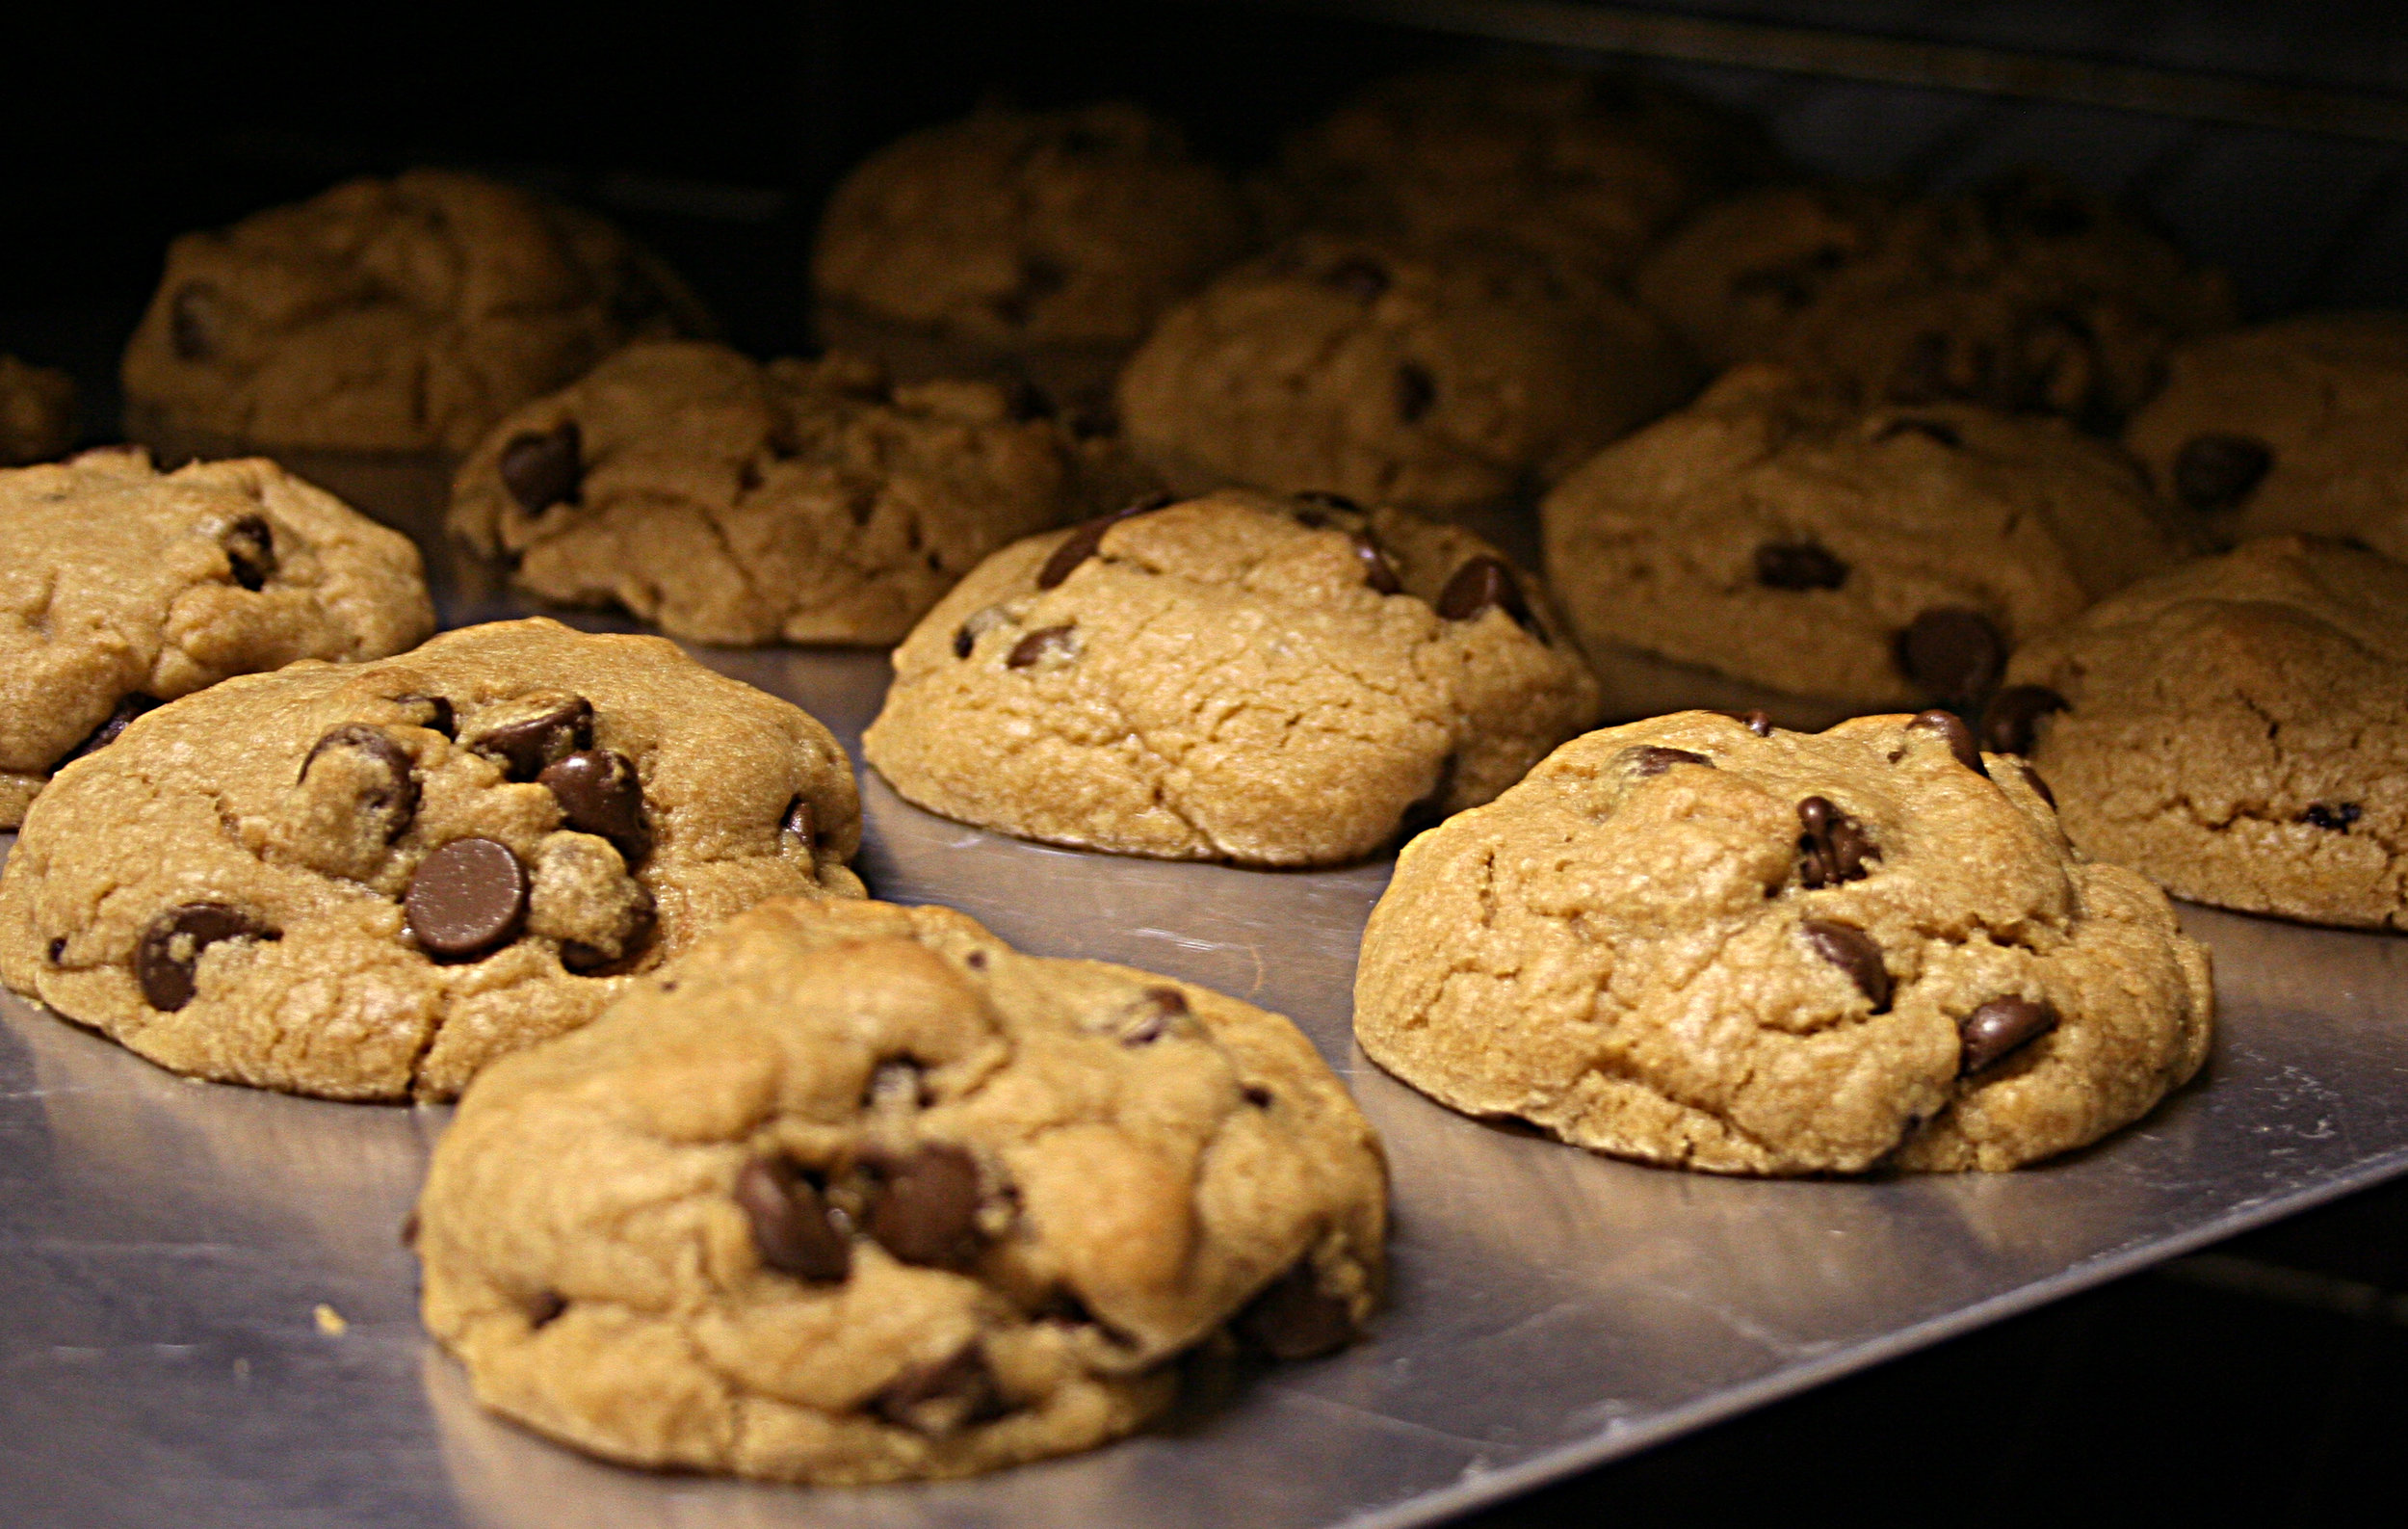 baking cookies in the oven